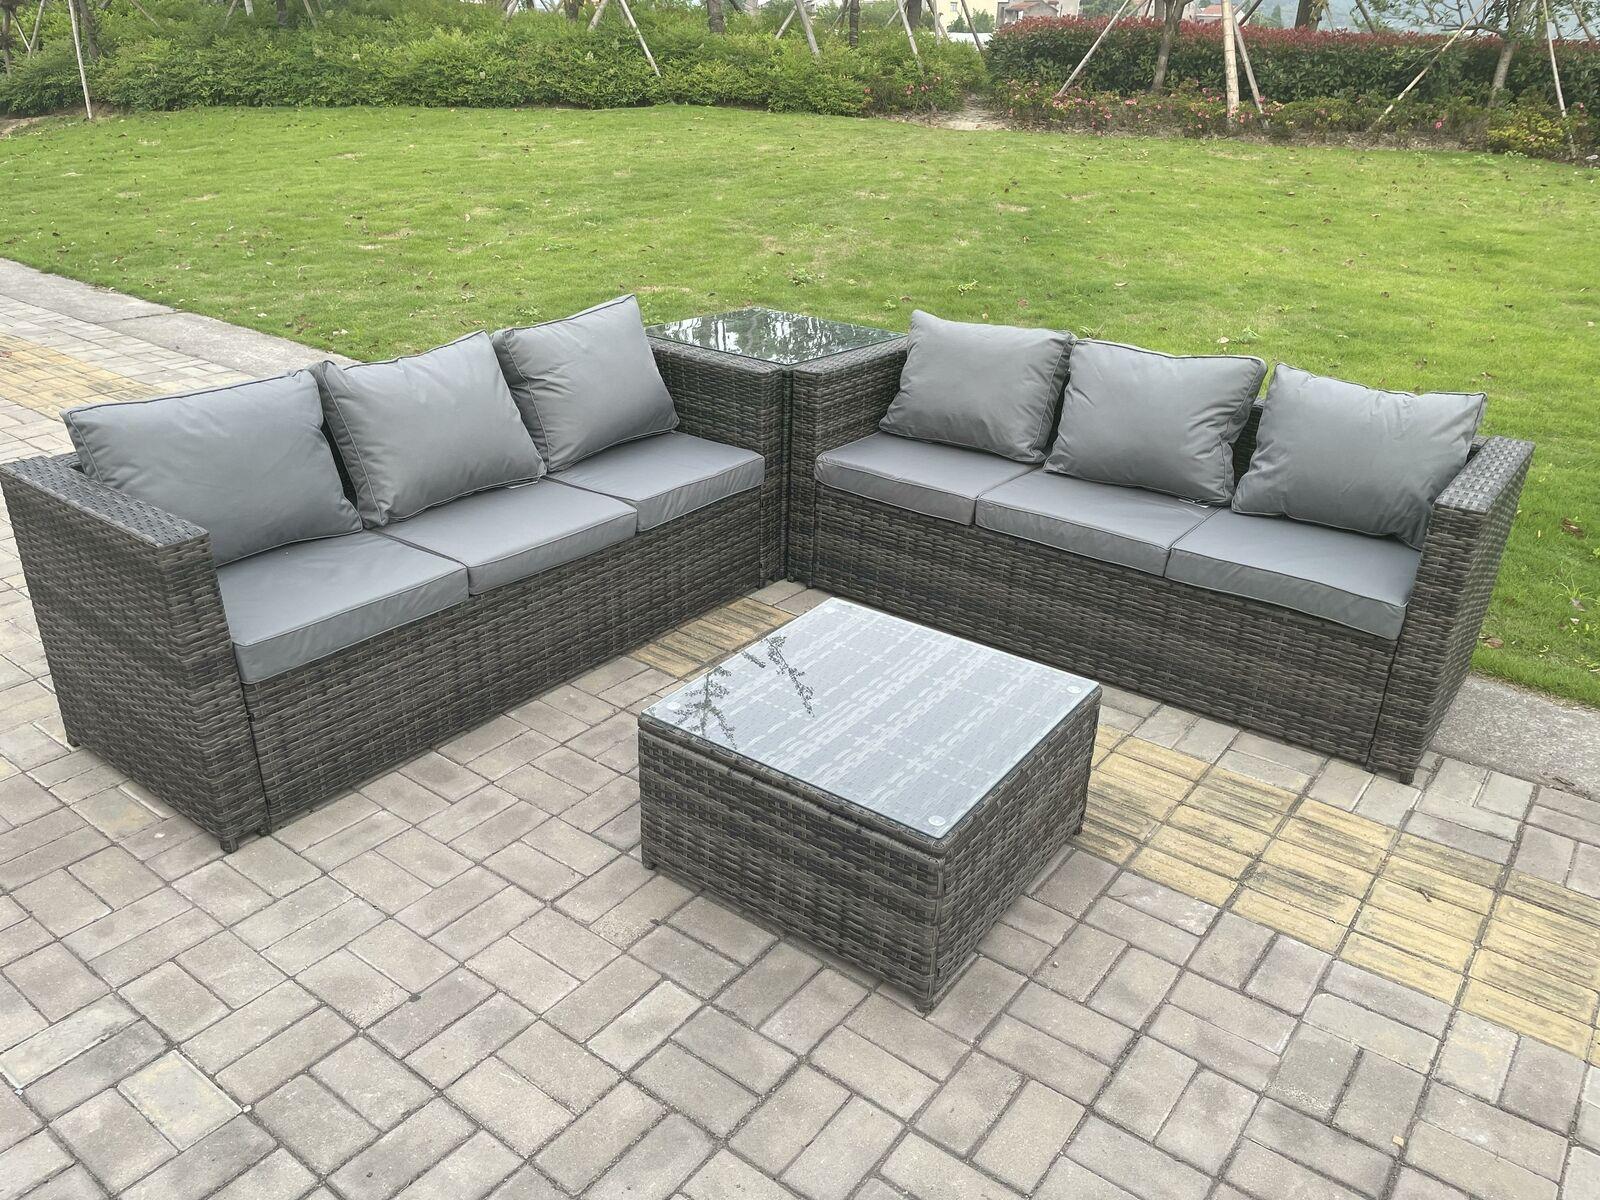 Garden Furniture - Wicker Rattan Garden Furniture Sofa Sets Outdoor Patio 2 Coffee Table